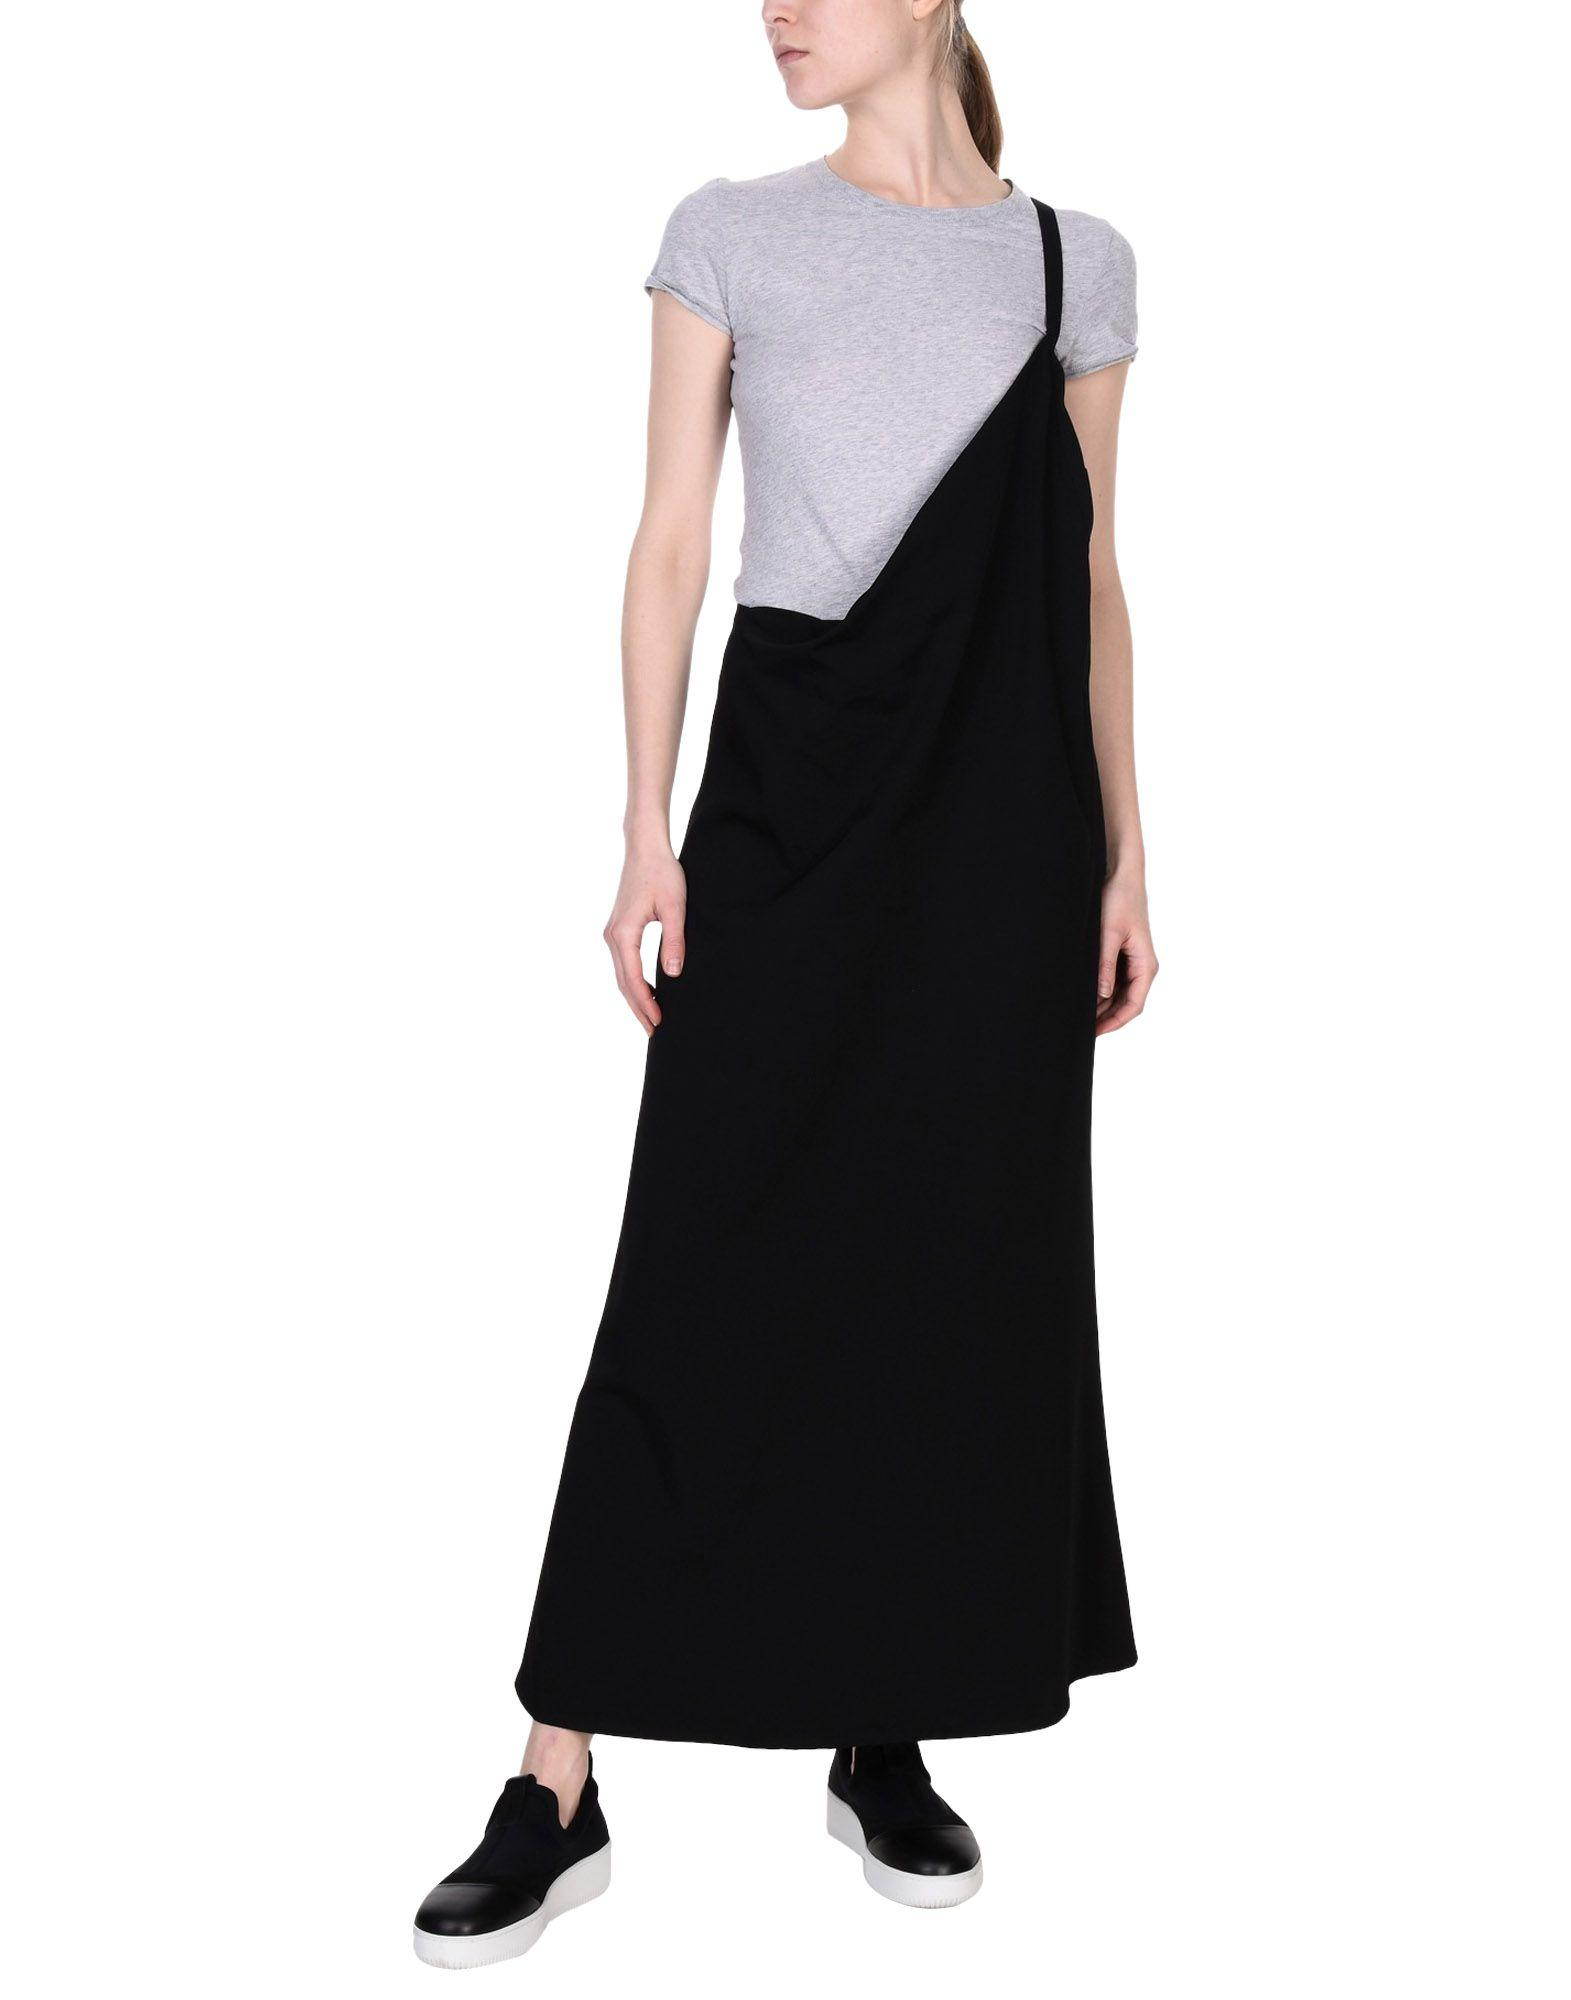 Yohji Yamamoto In Black